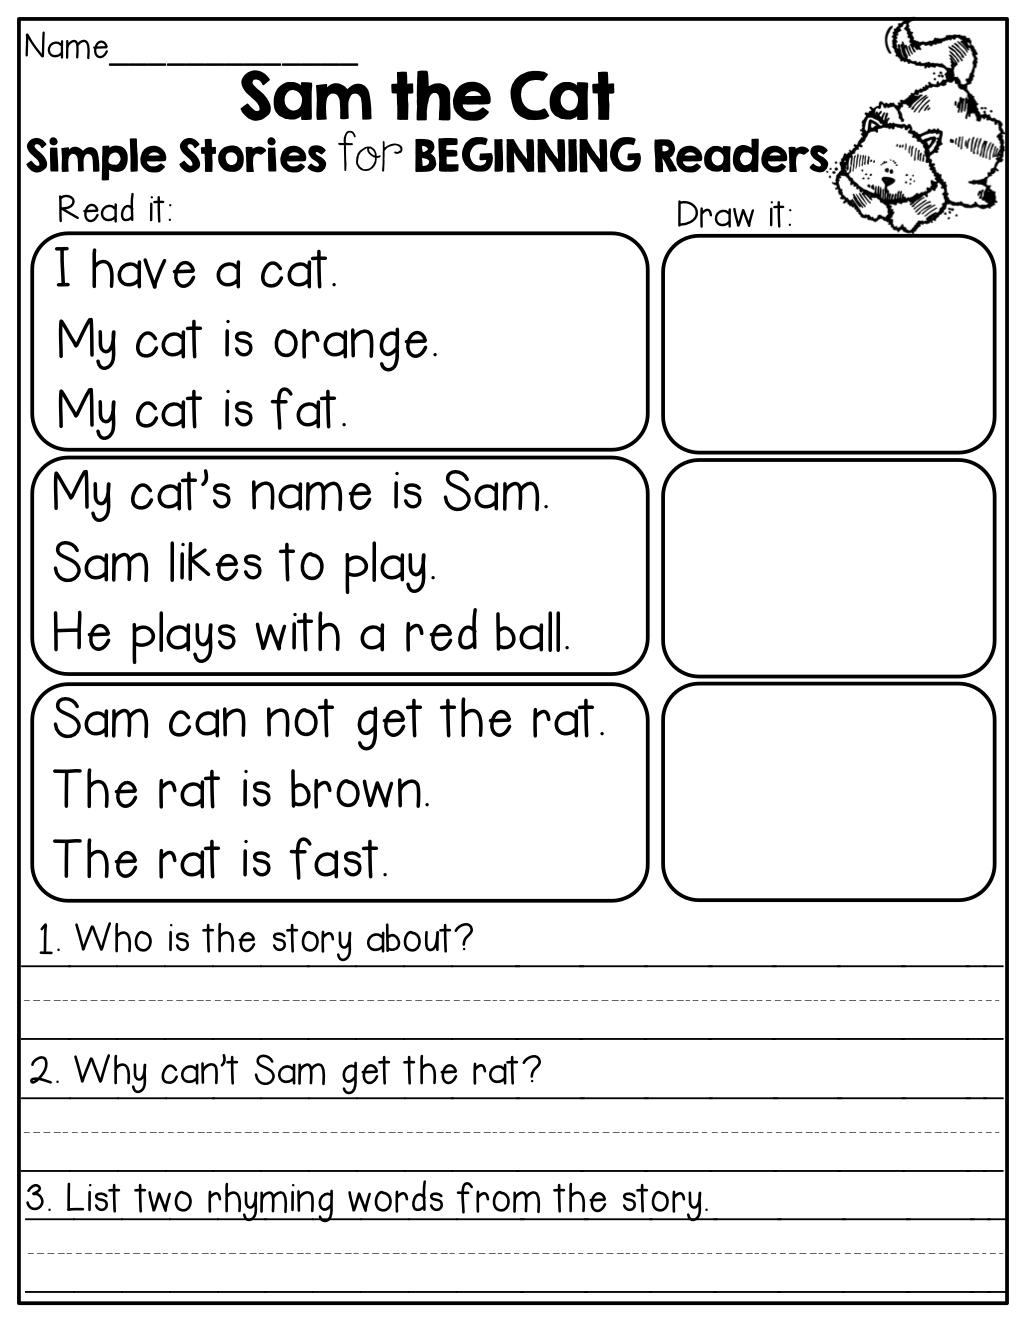 Worksheet Kindergarten Comprehension Stories simple stories for beginning readers i love the comprehension questions at end